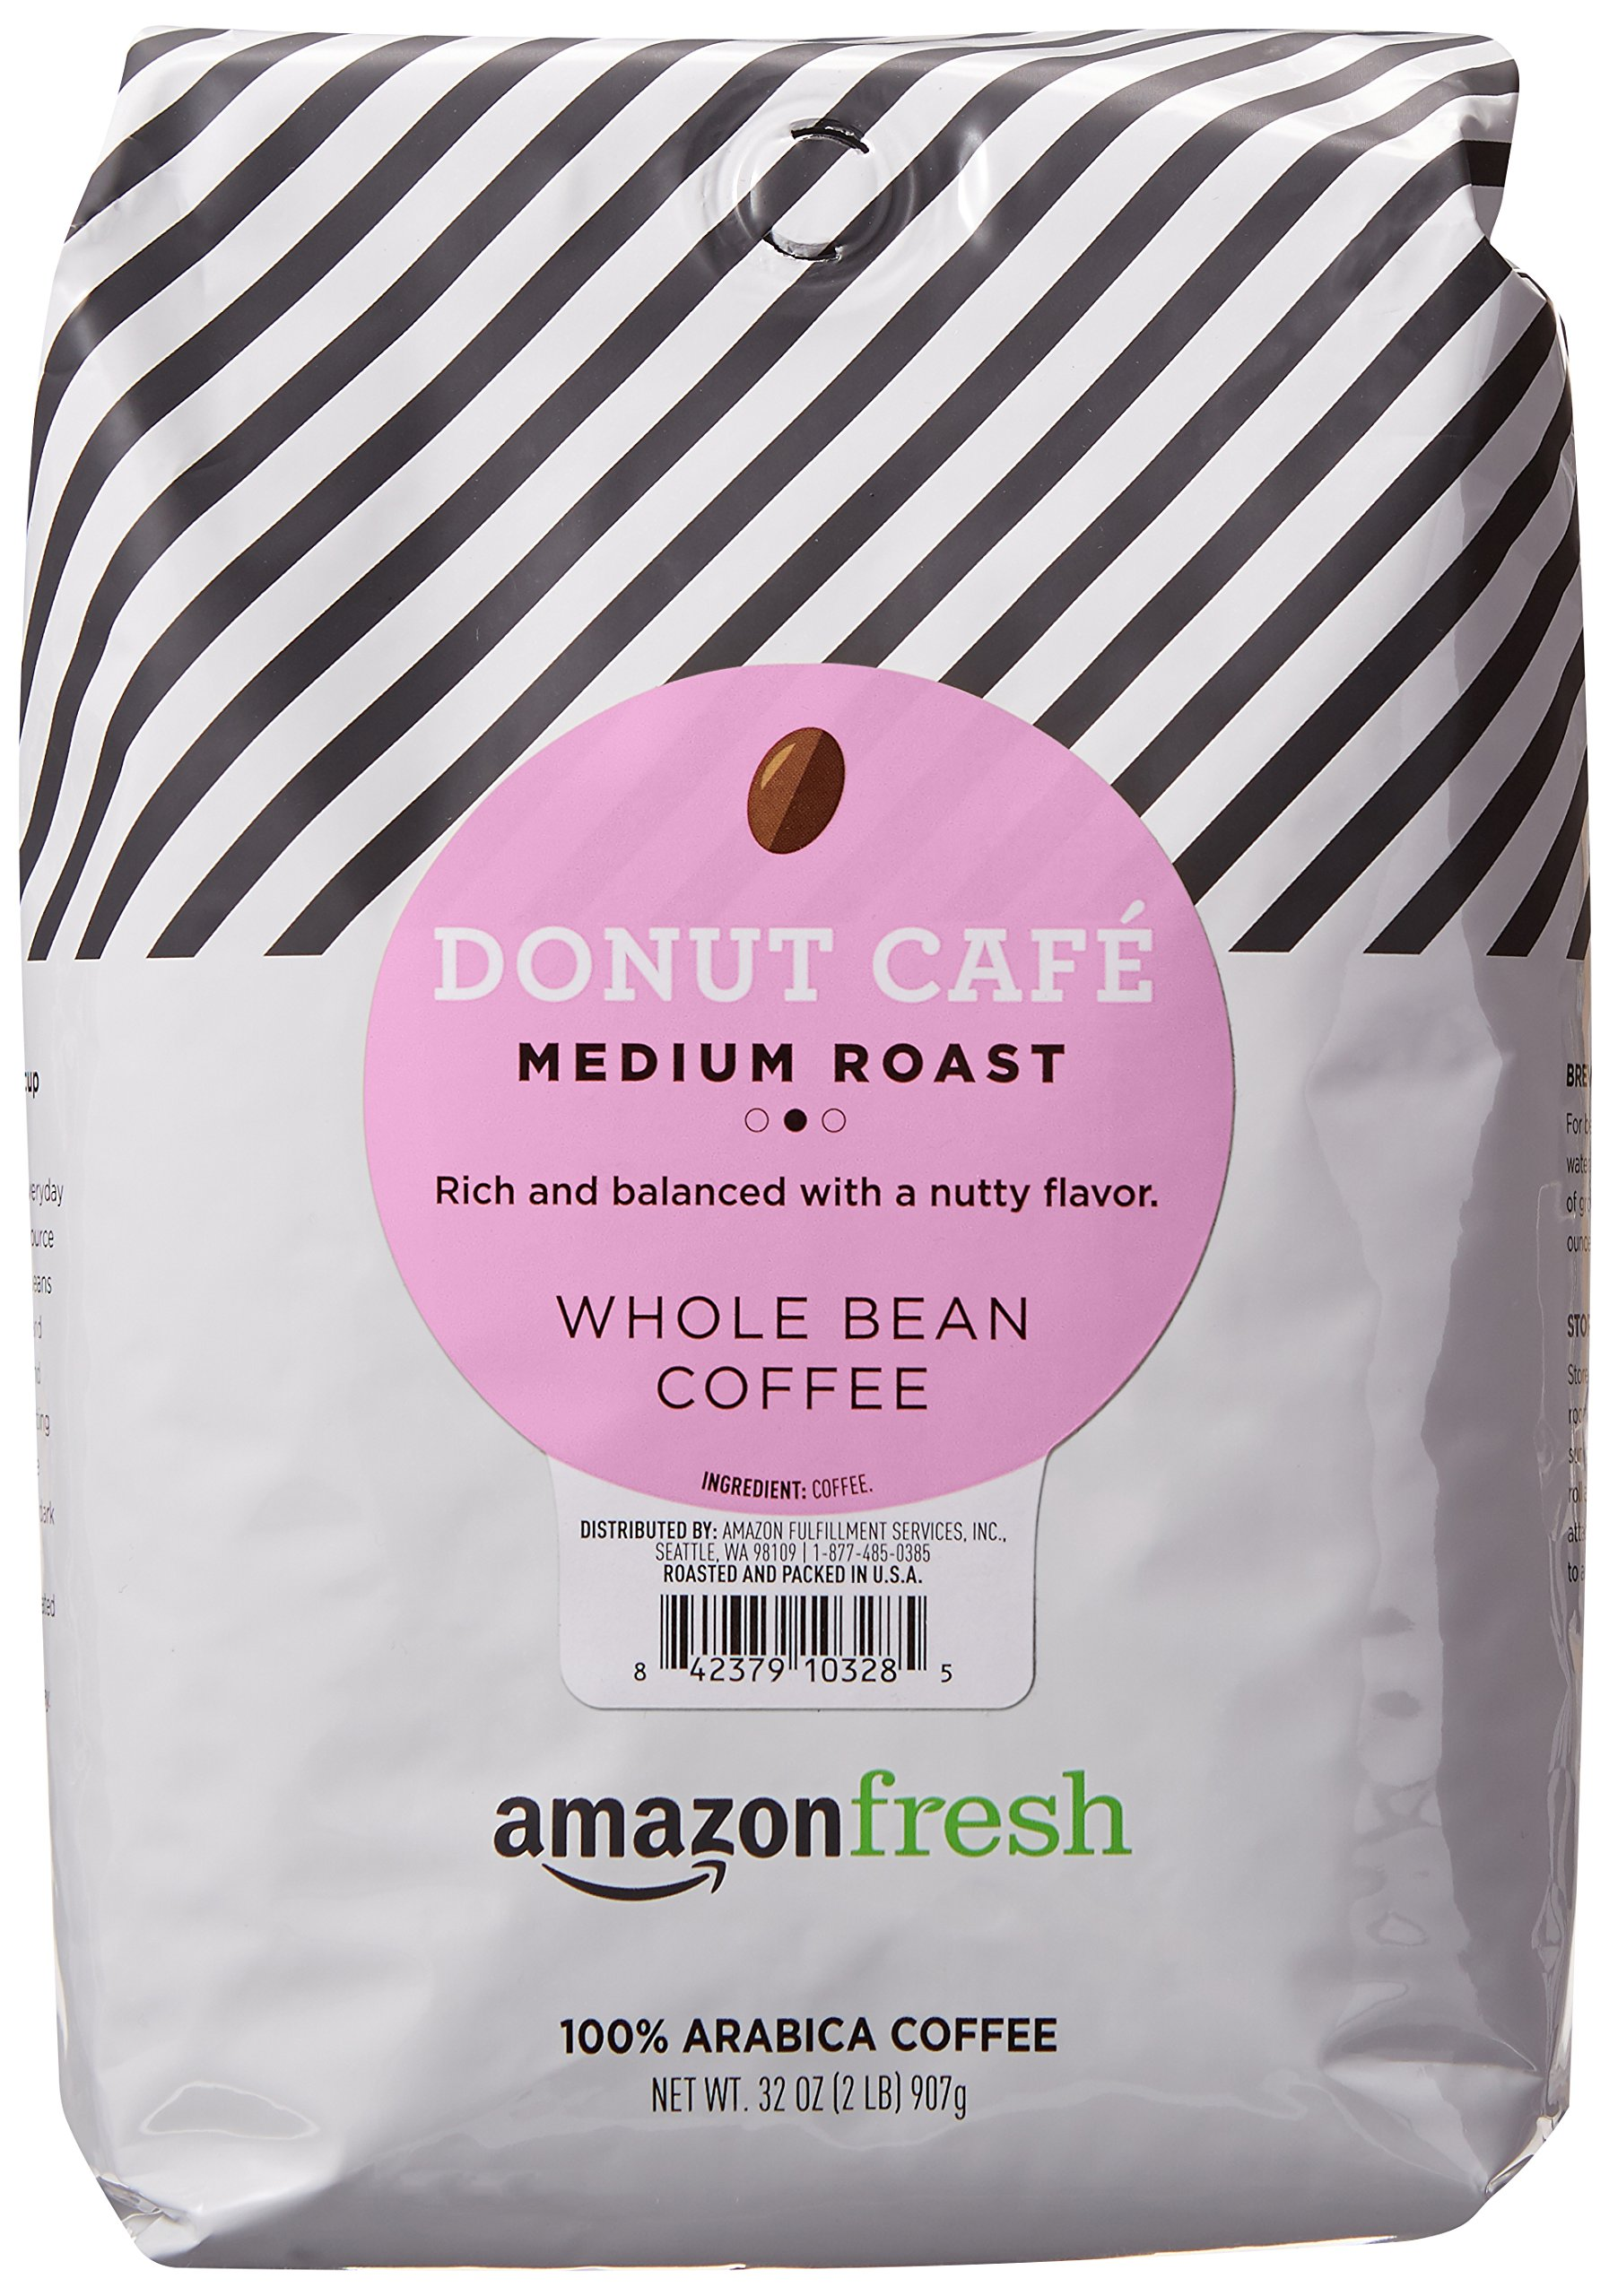 AmazonFresh Donut Cafe Whole Bean Coffee, Medium Roast, 32 Ounce